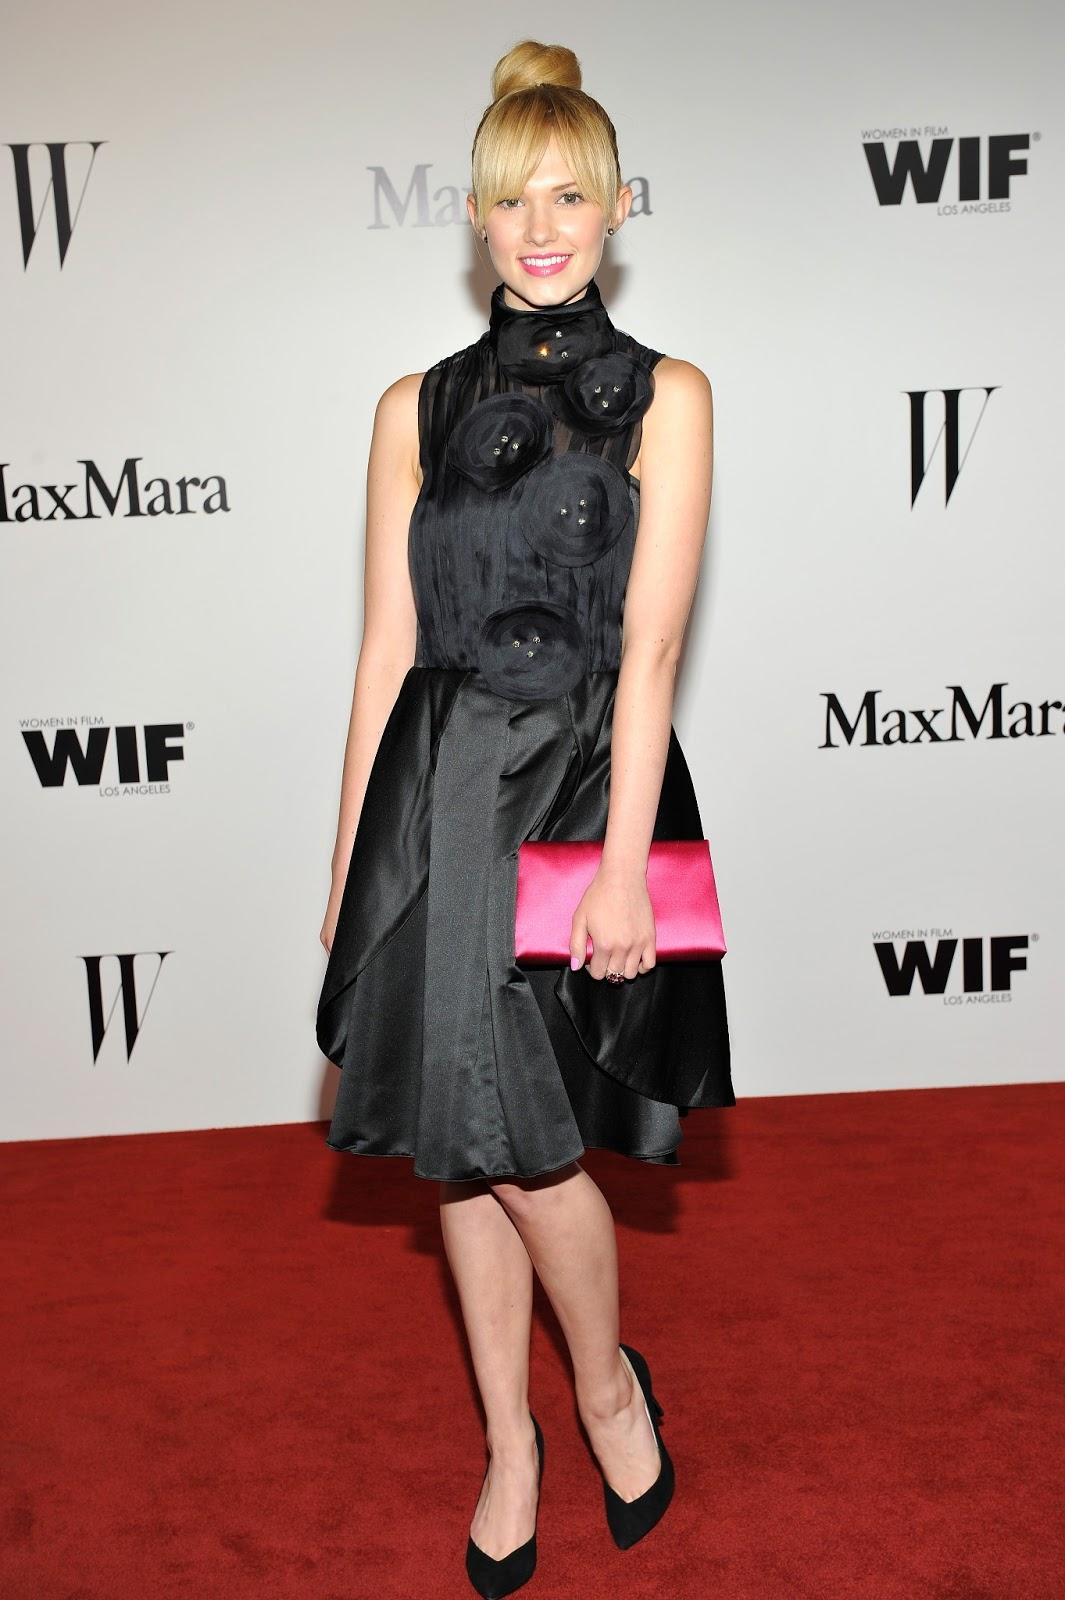 Fashion & True Style: Max Mara & W Magazine Host Party for ...